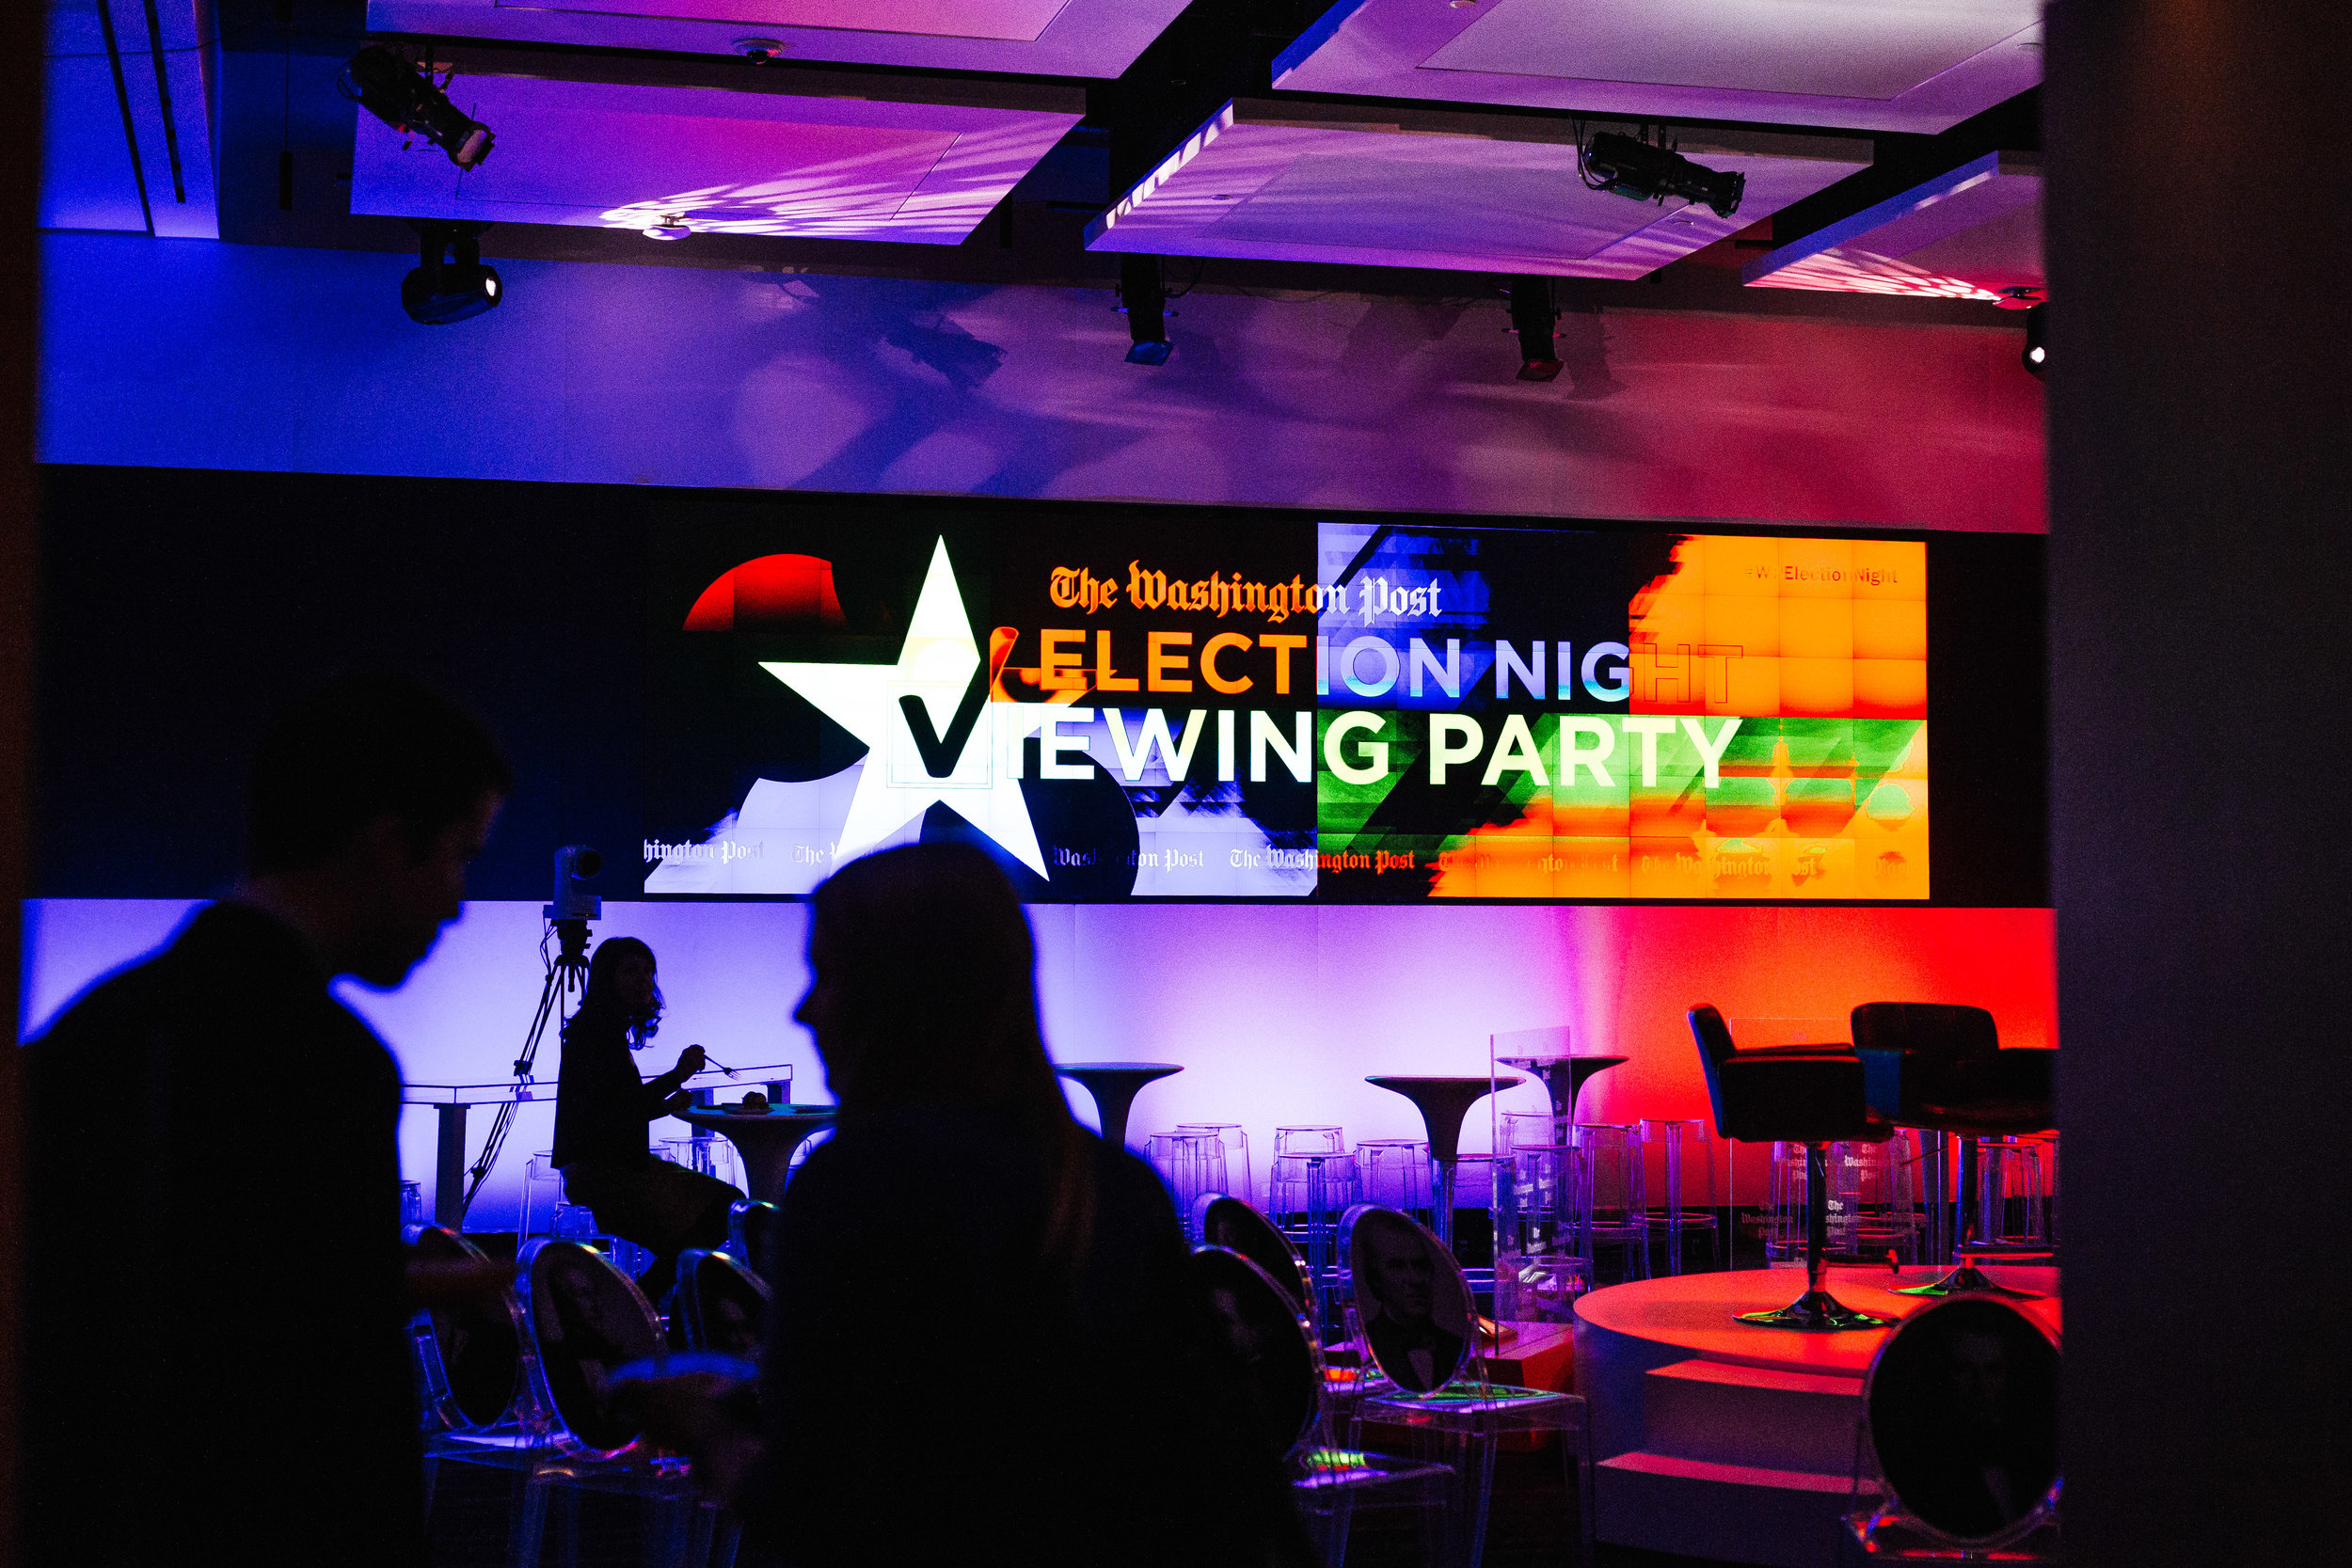 Washington Post Election Night-1.jpg